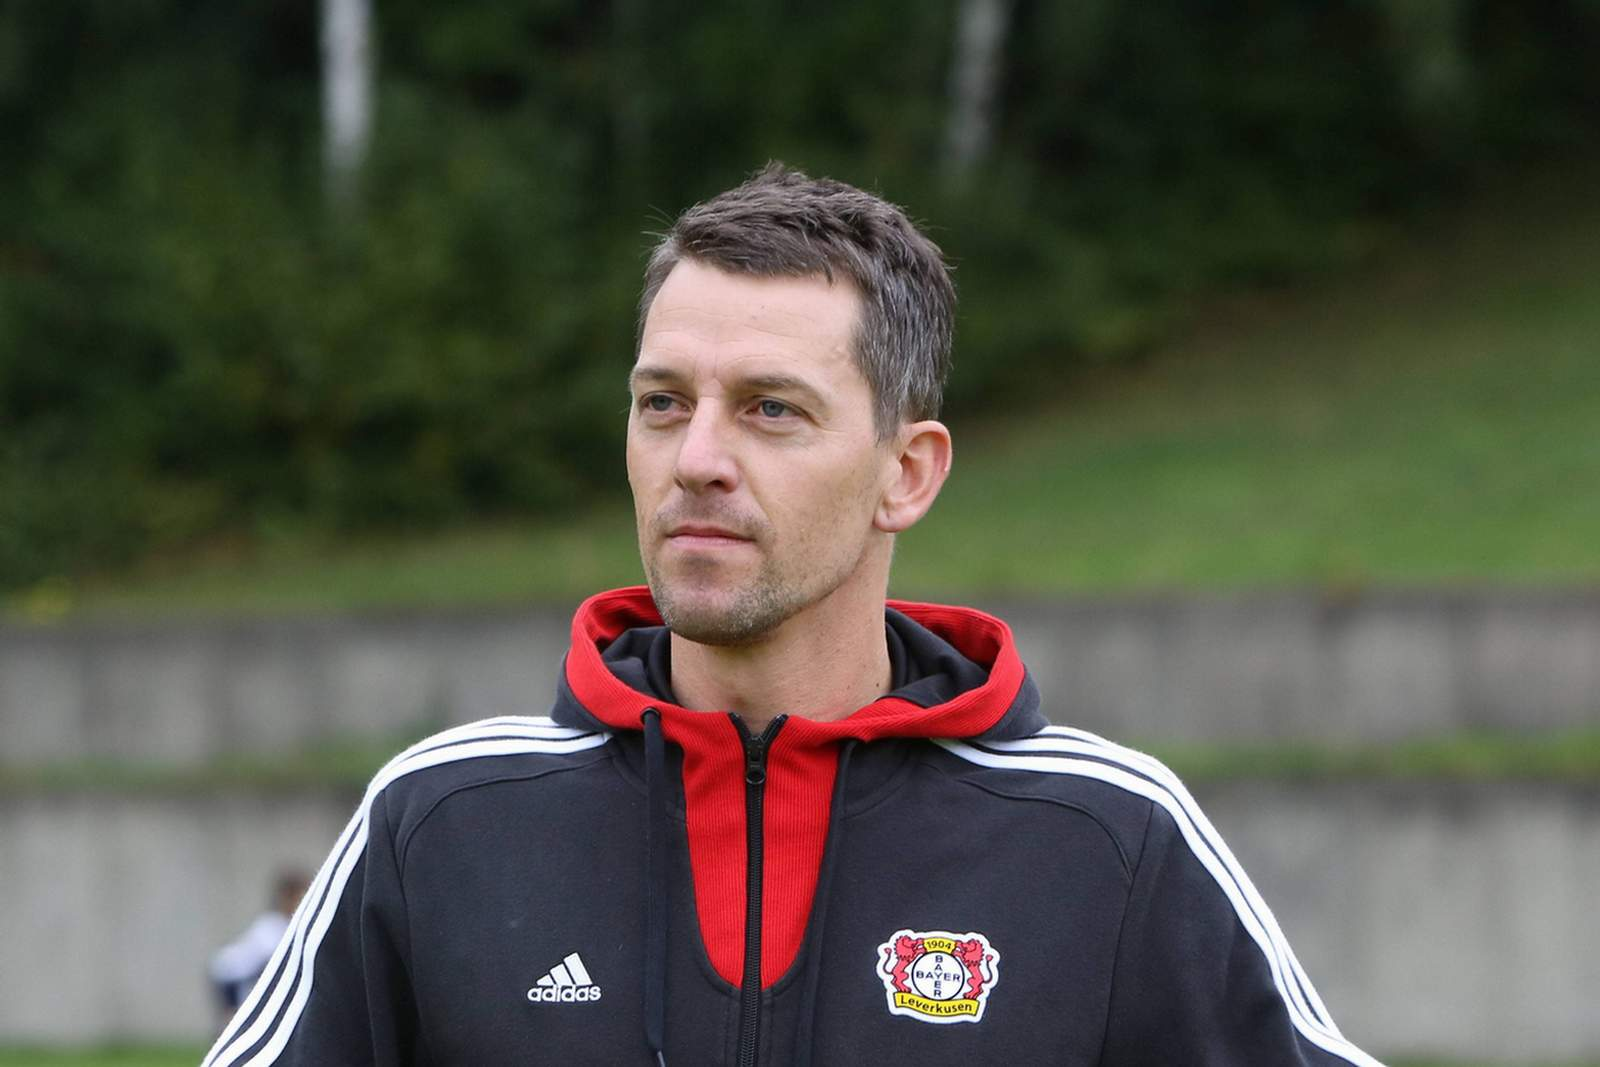 Nils Drube war bislang Scout bei Bayer Leverkusen